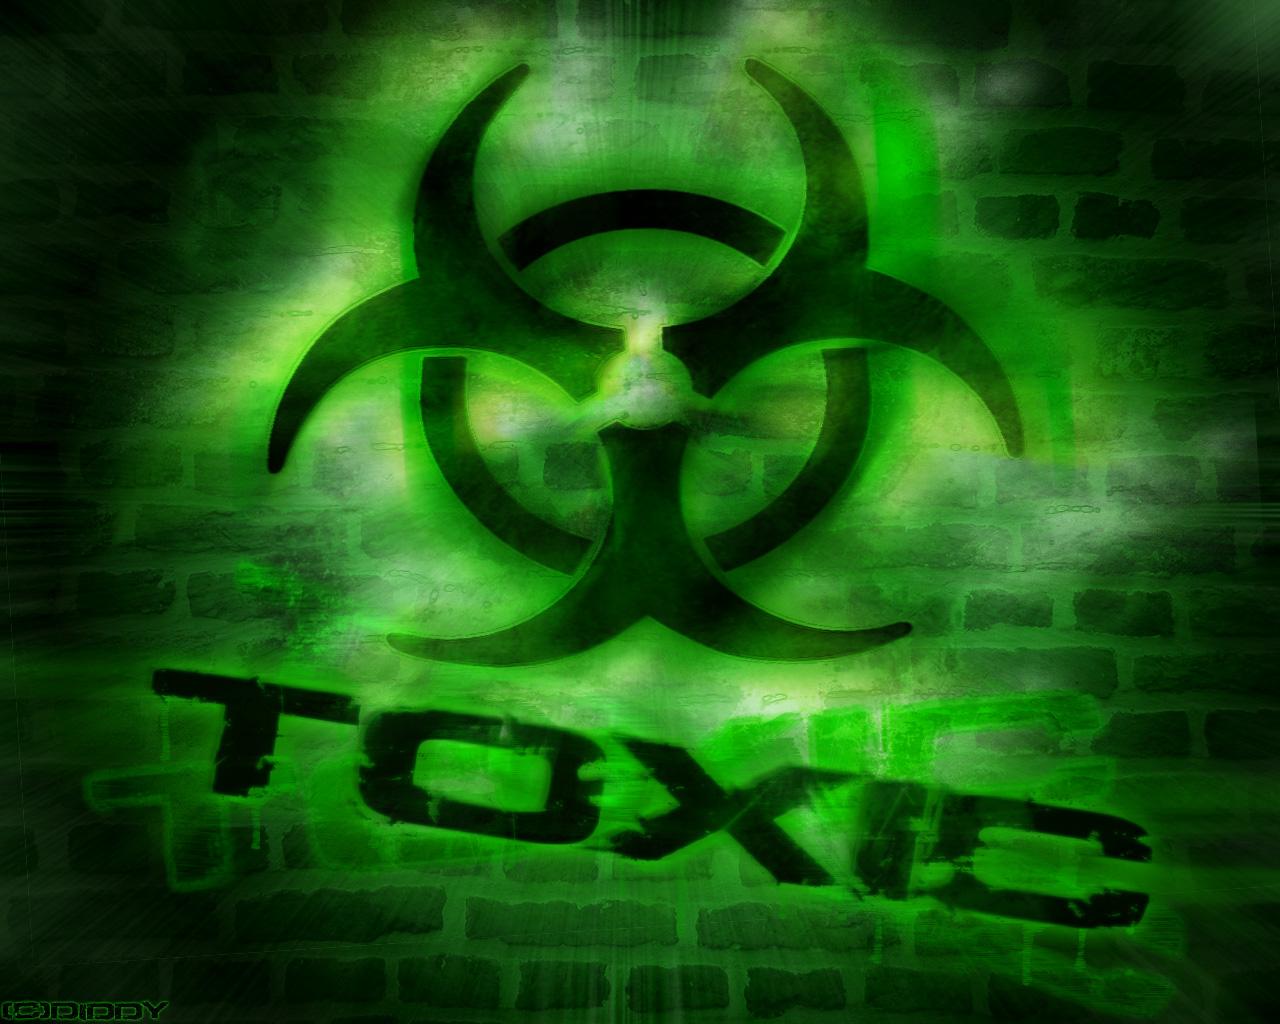 Toxic! - teamRIPPED